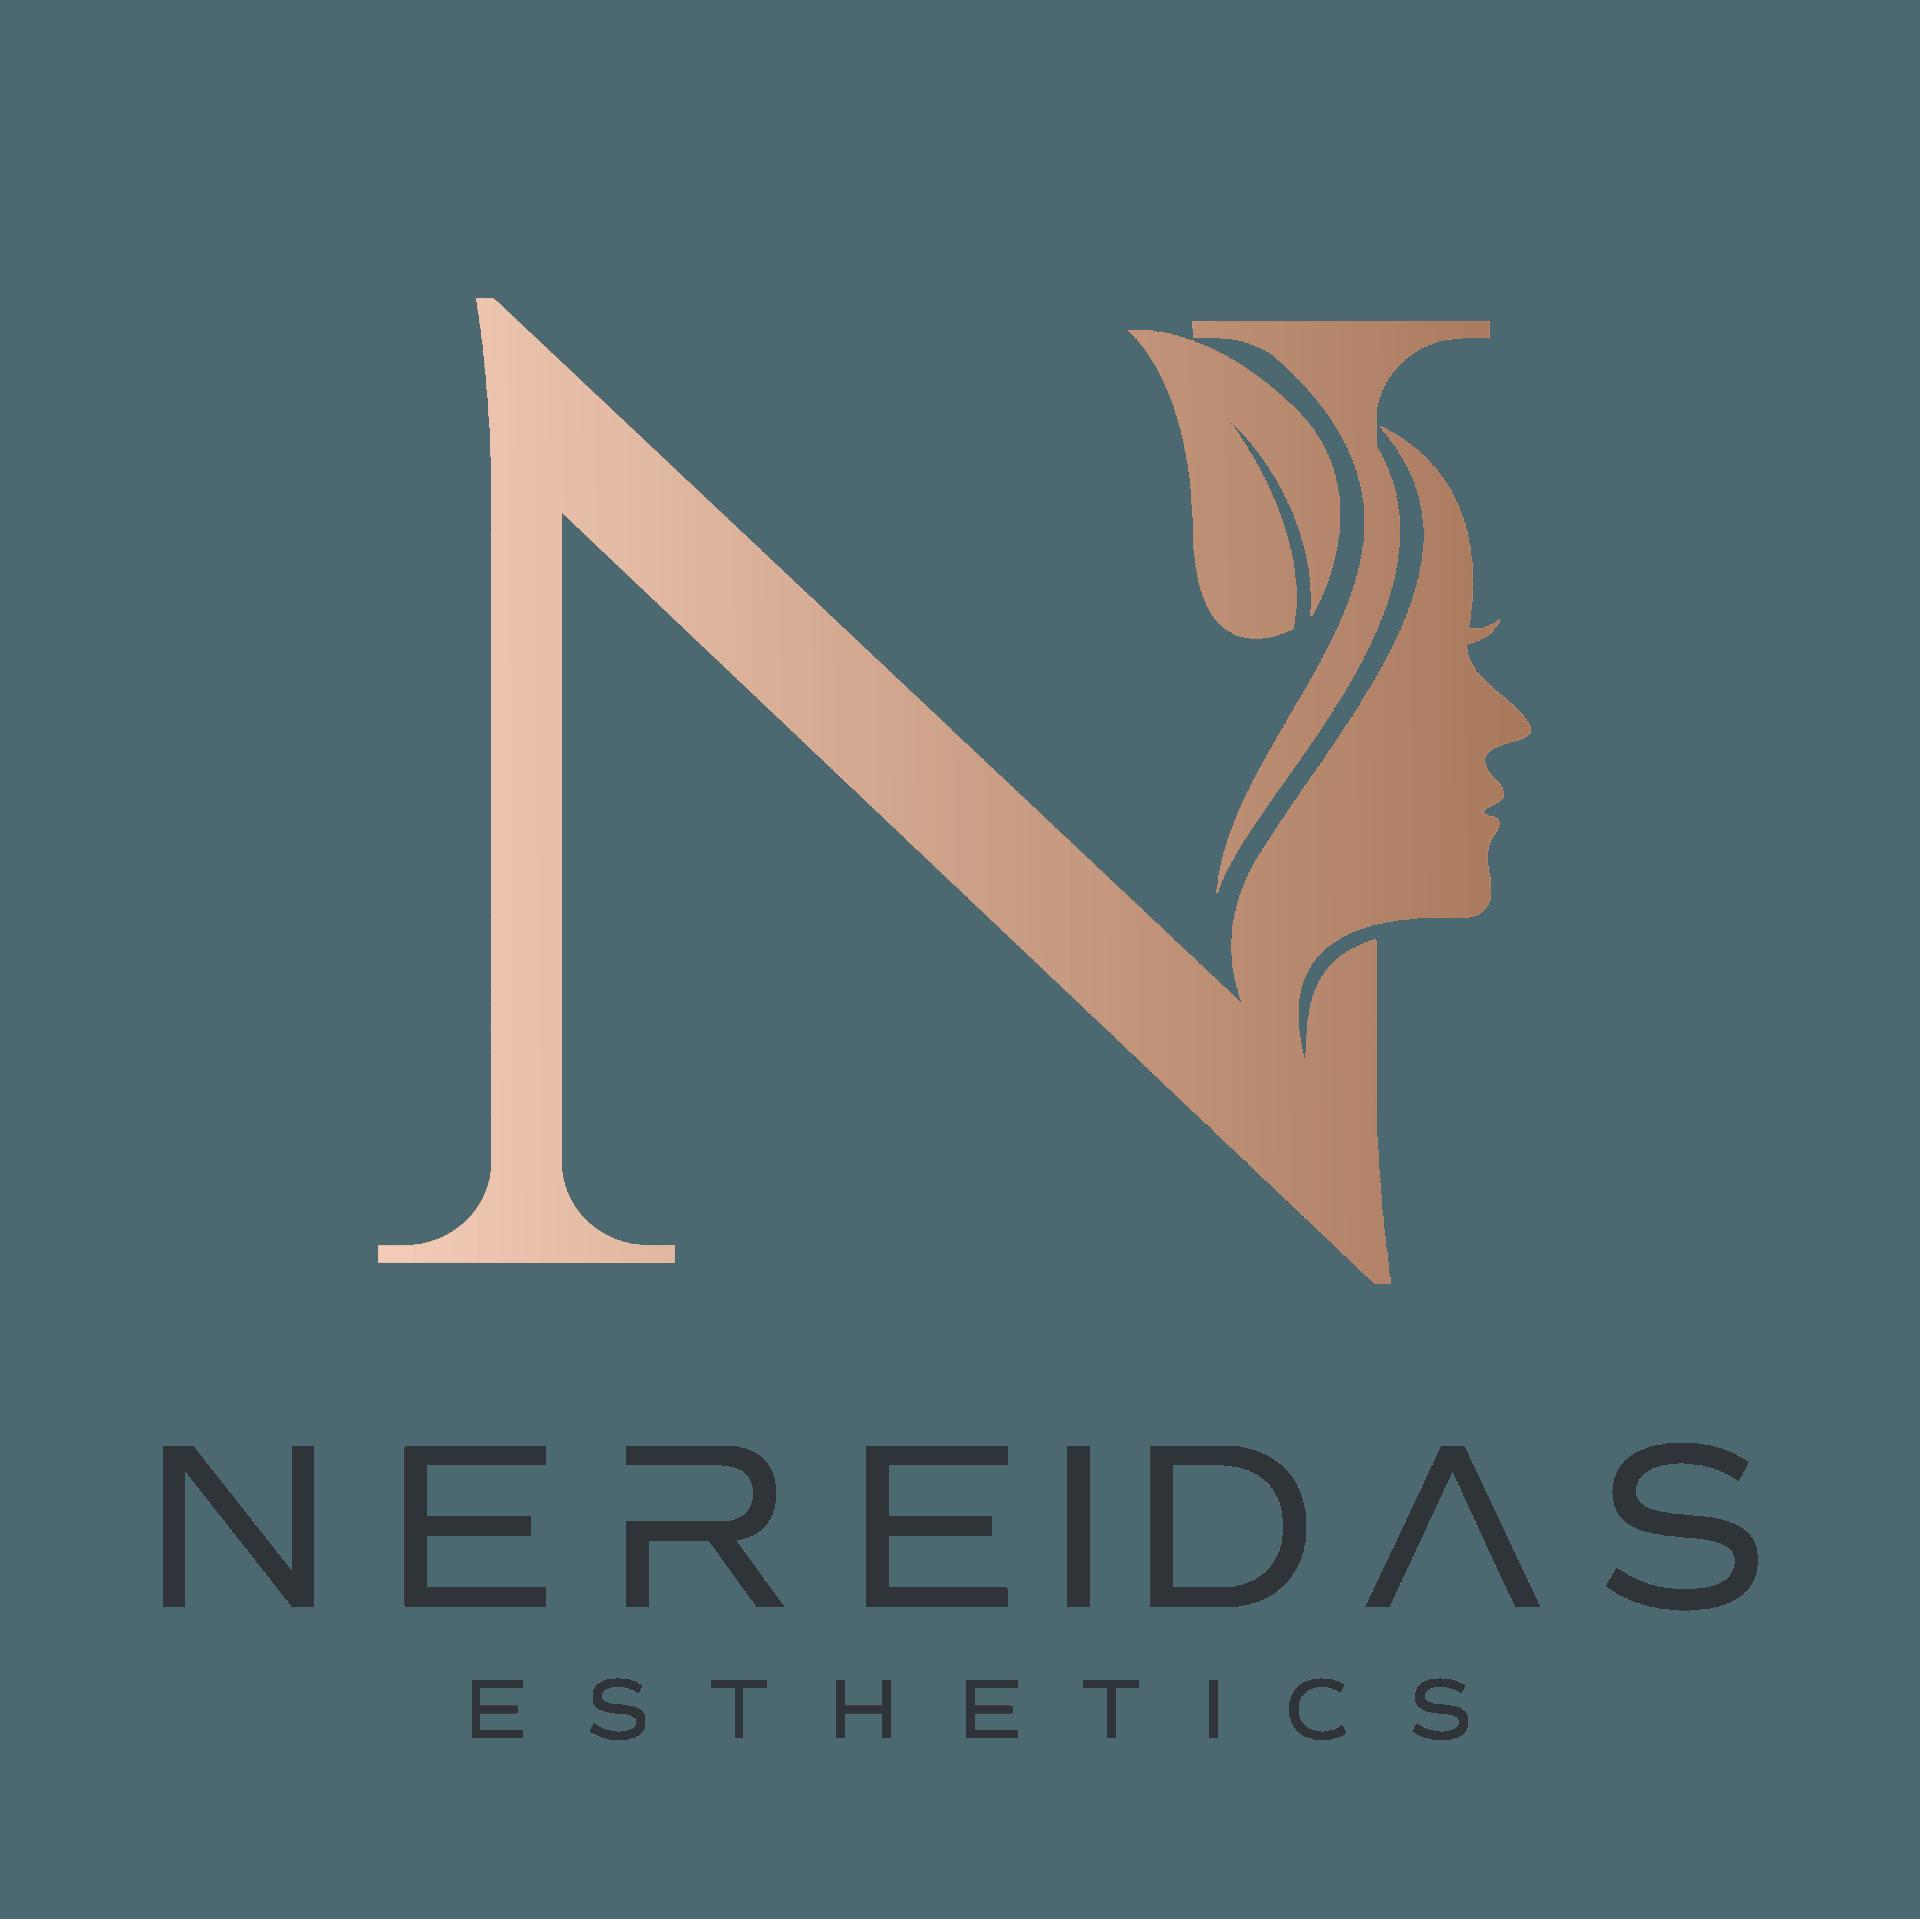 Nereidas Esthetics Logo